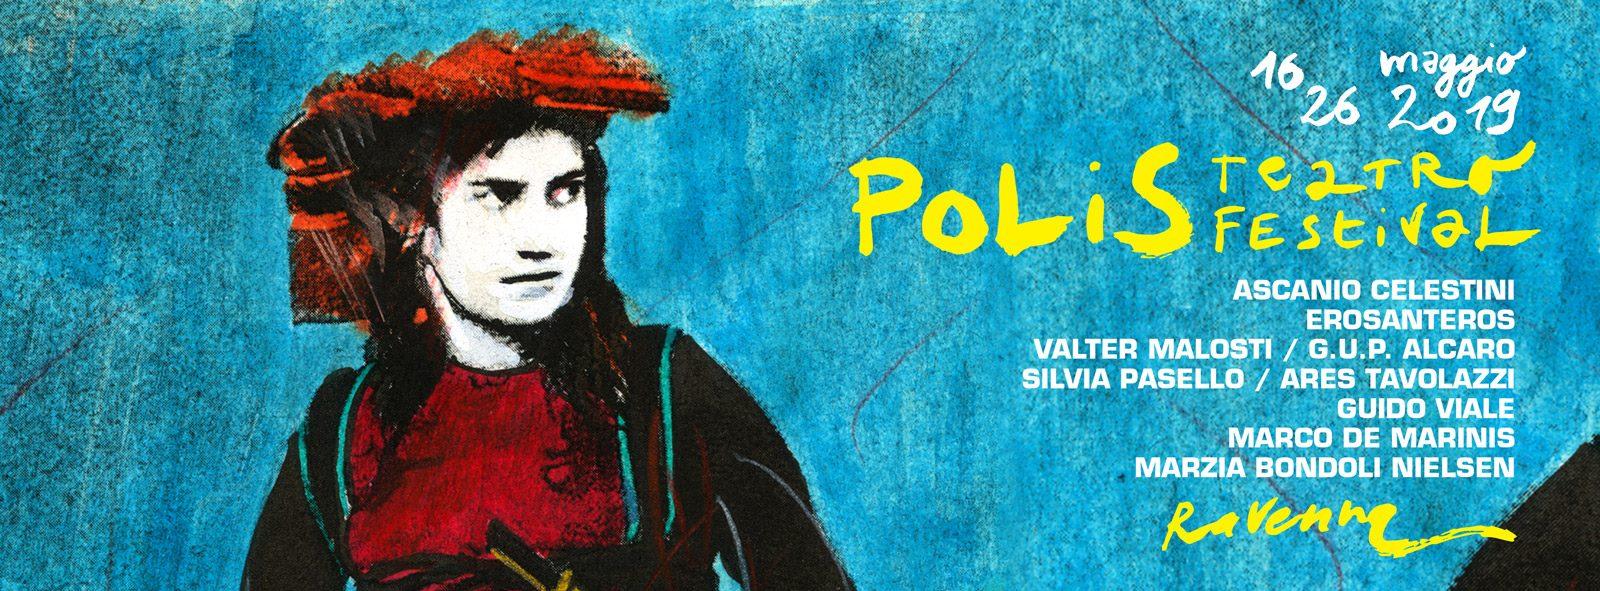 Meeting Your Eyes @ Polis Teatro Festival